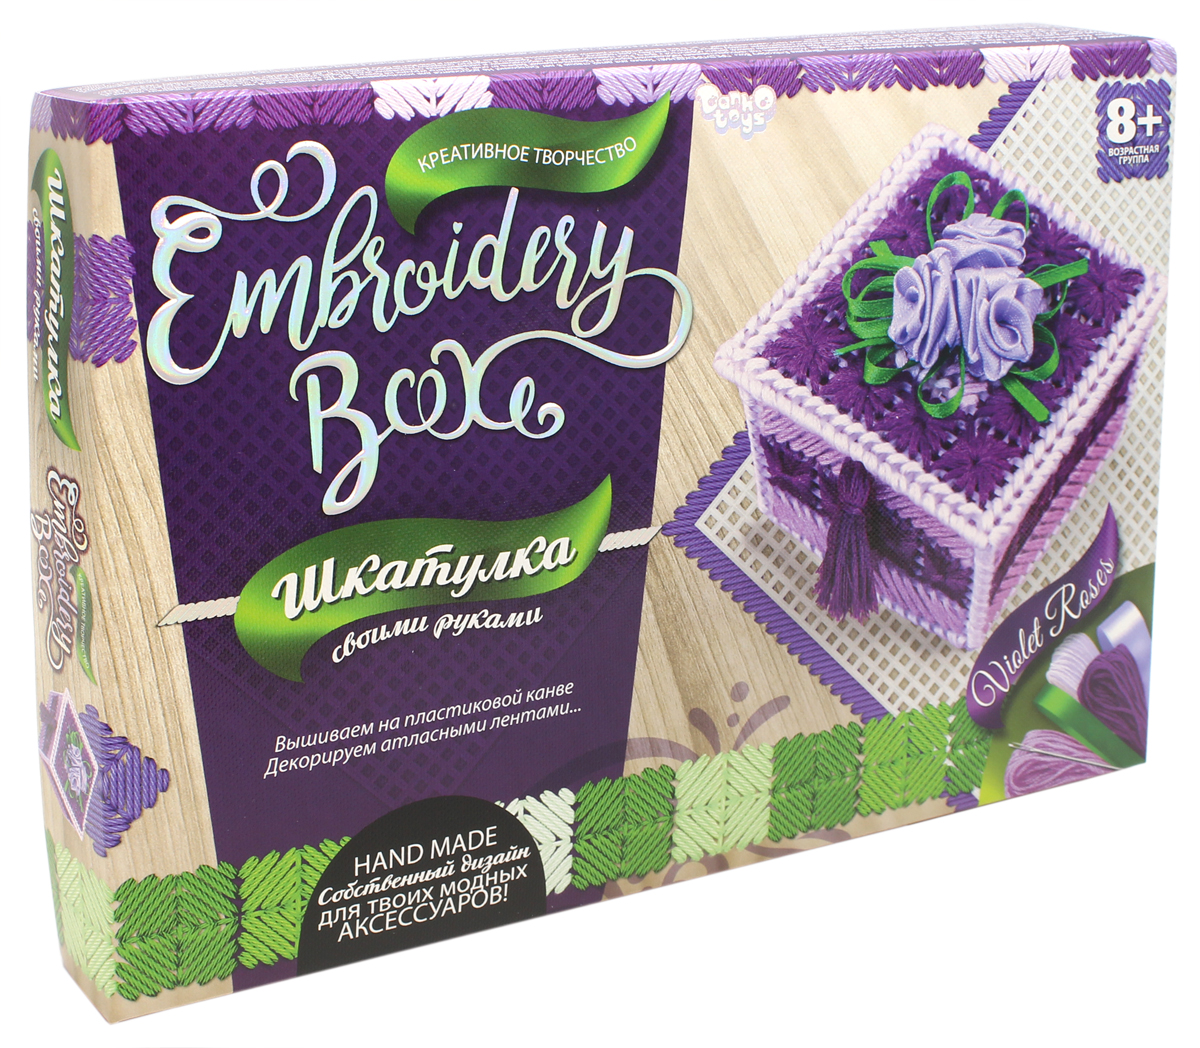 Danko Toys Набор для декорирования Embroidery Box Шкатулка цвет фиолетовый